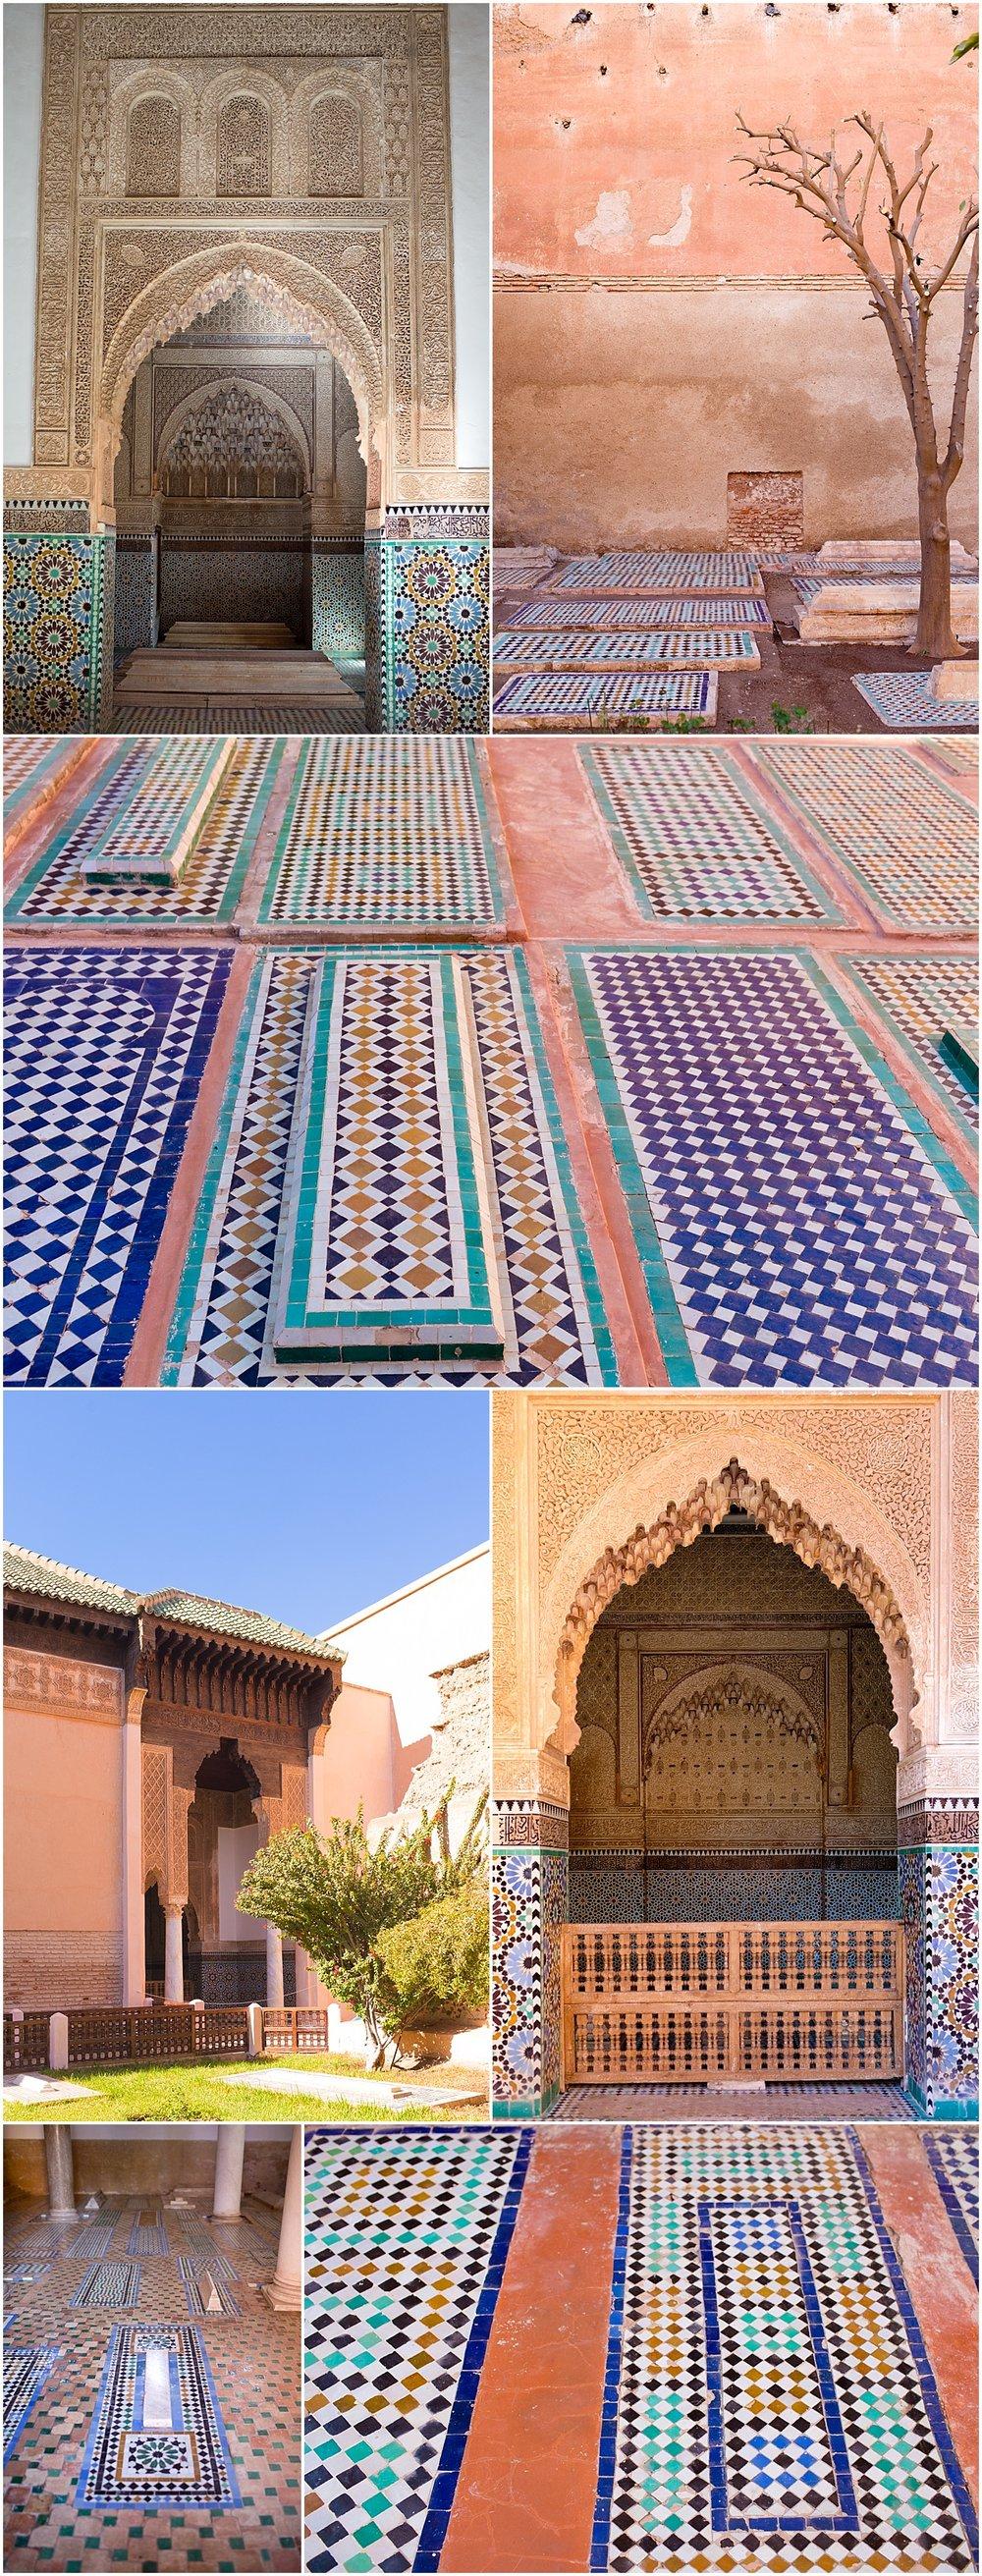 Saadian tombs of Marrakech, Morocco - travel blog